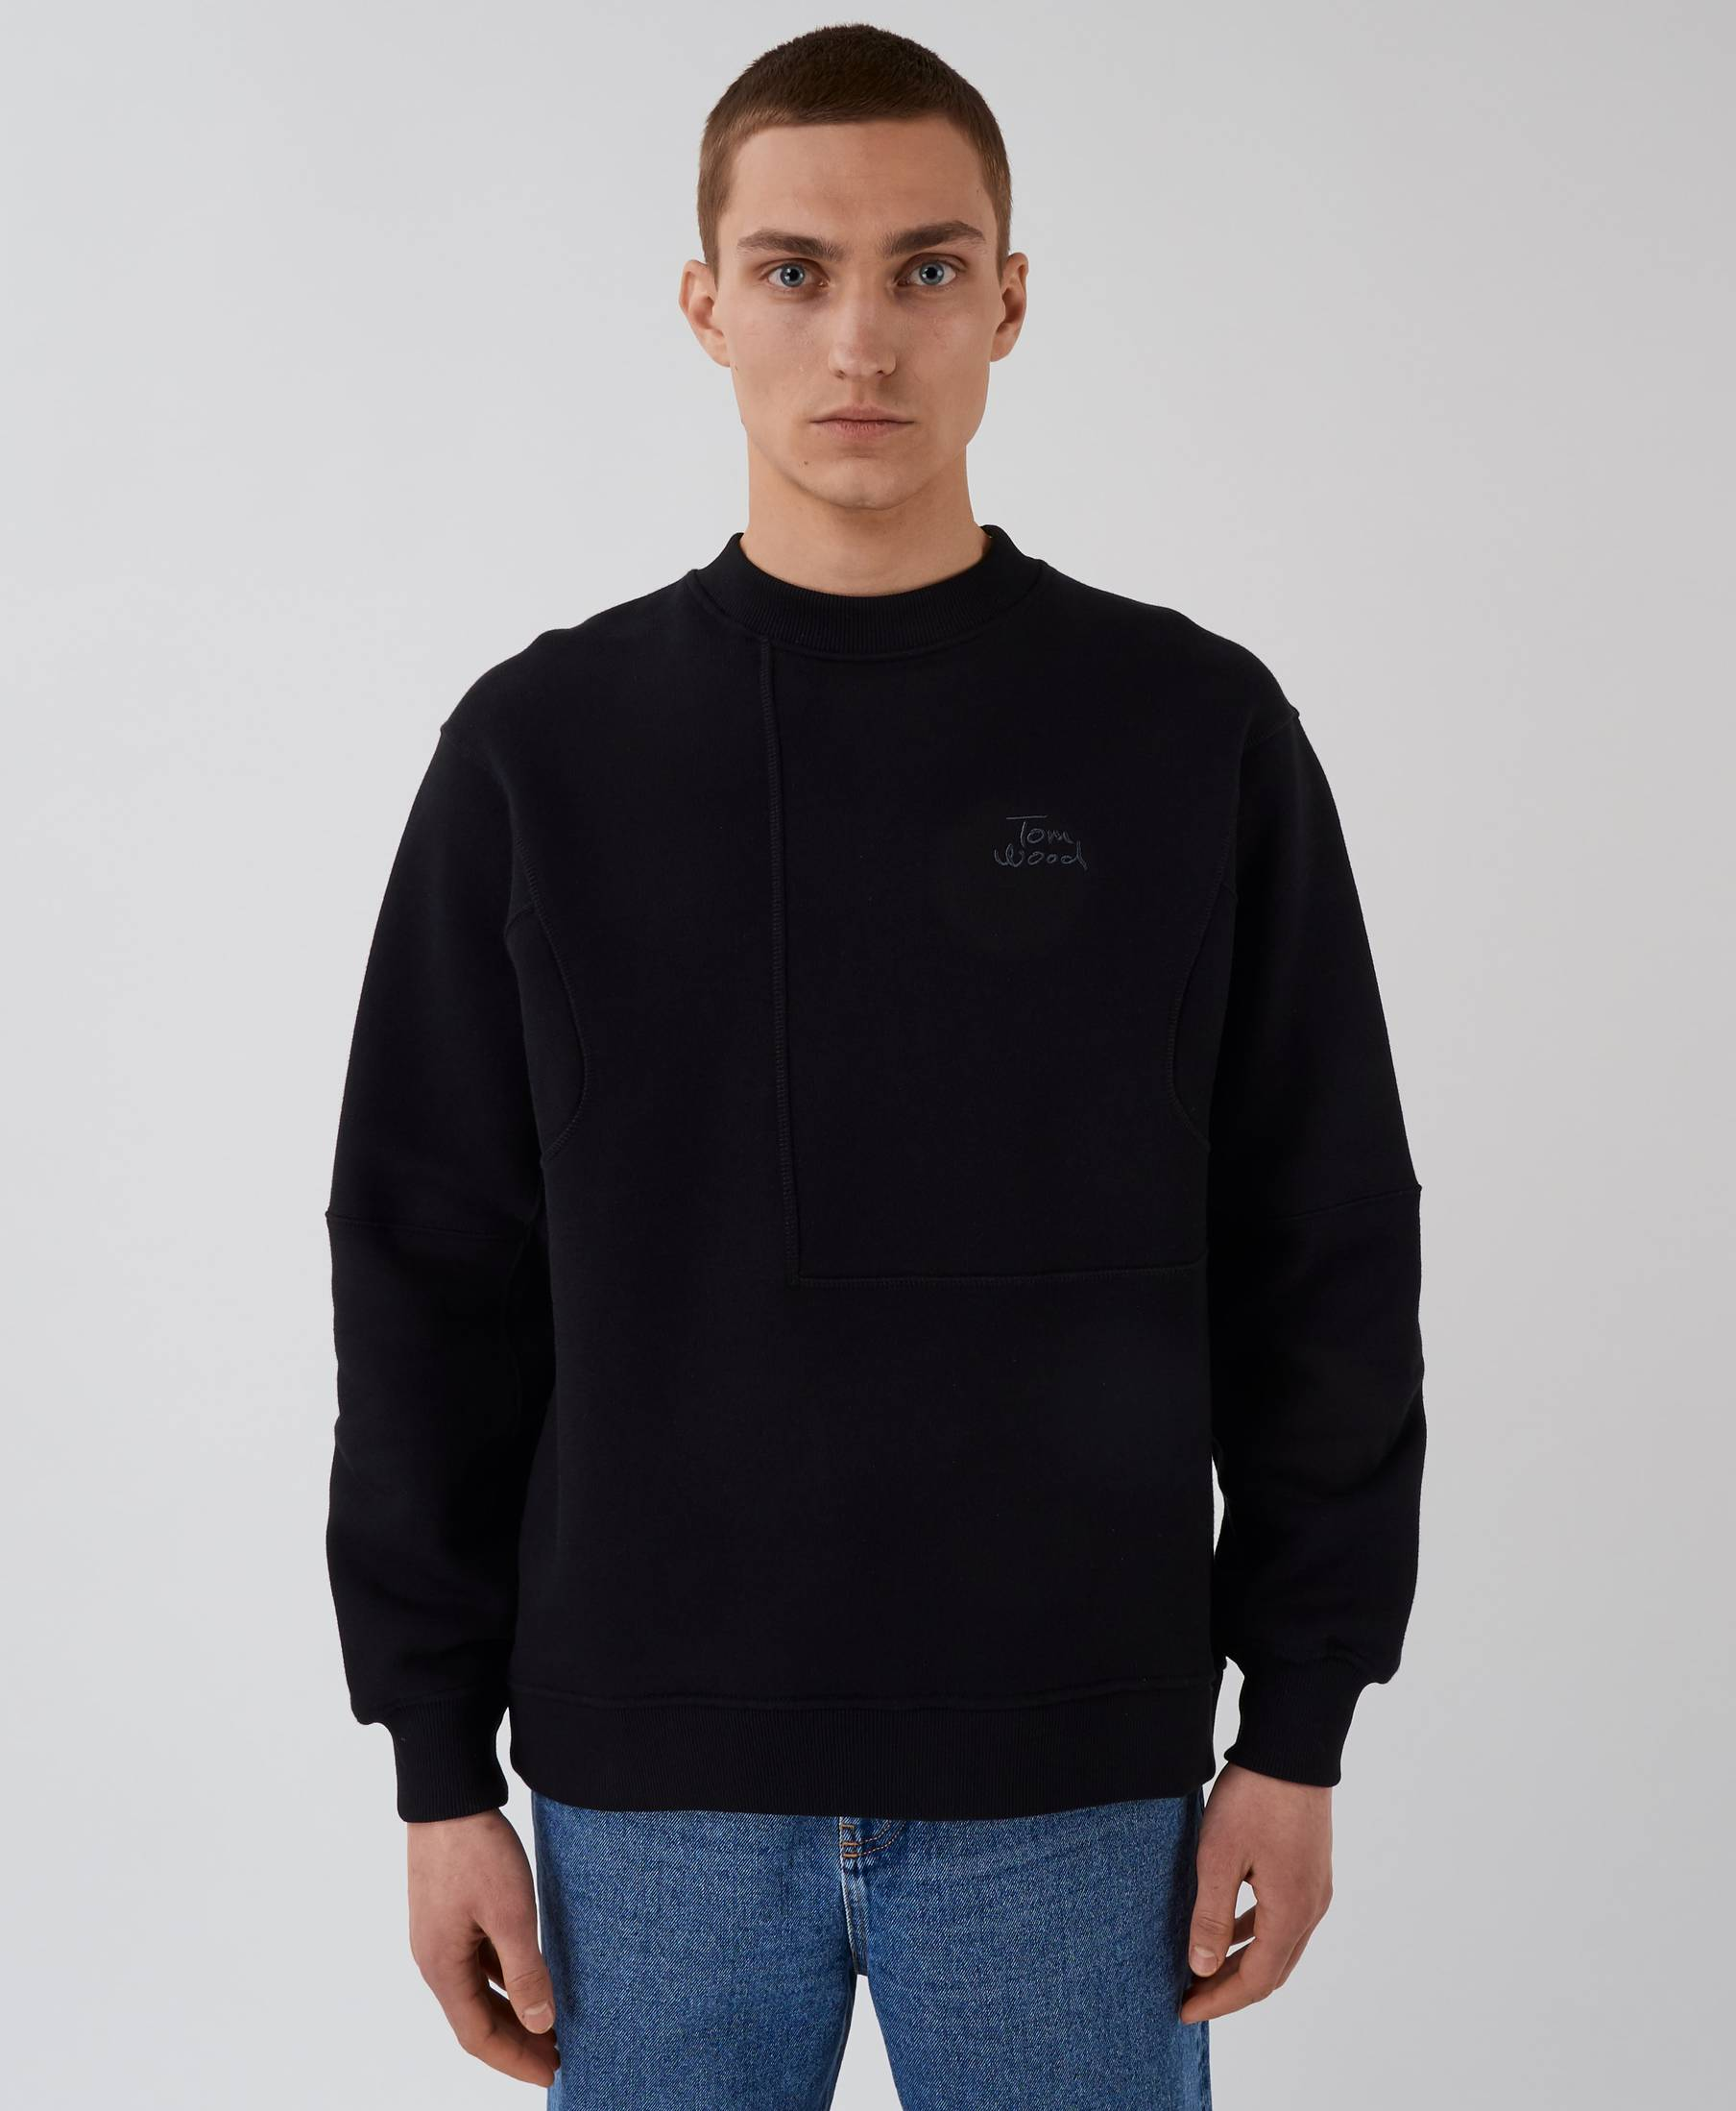 The Waves Sweater Pistol Black